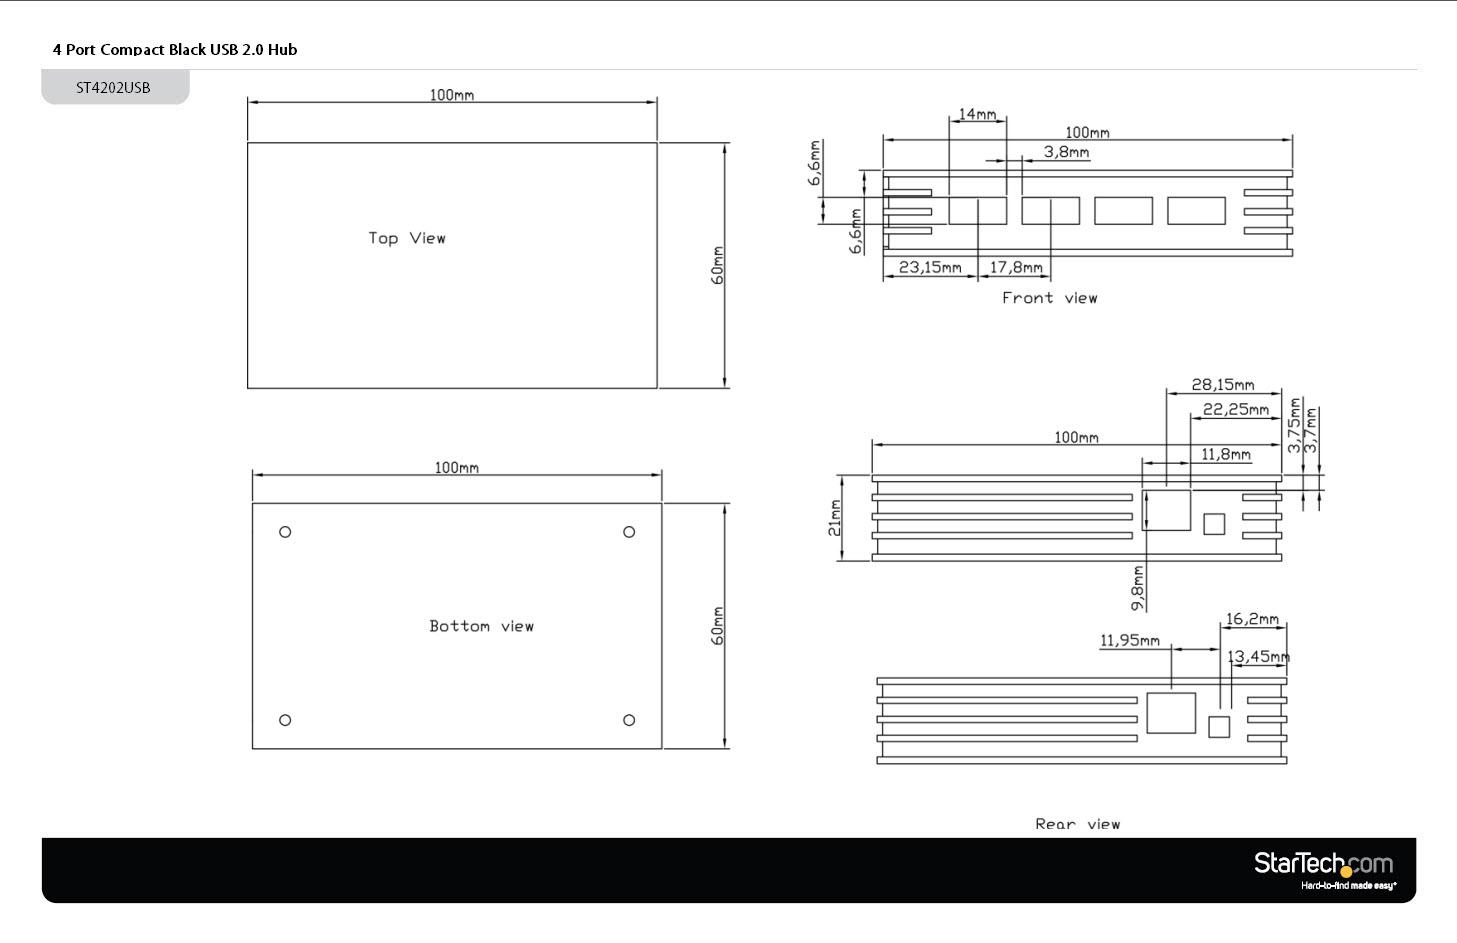 4 Port Compact Black Usb 20 Hub Usb2 Hubs Canada Sqauare Wiring Diagram Diagrams